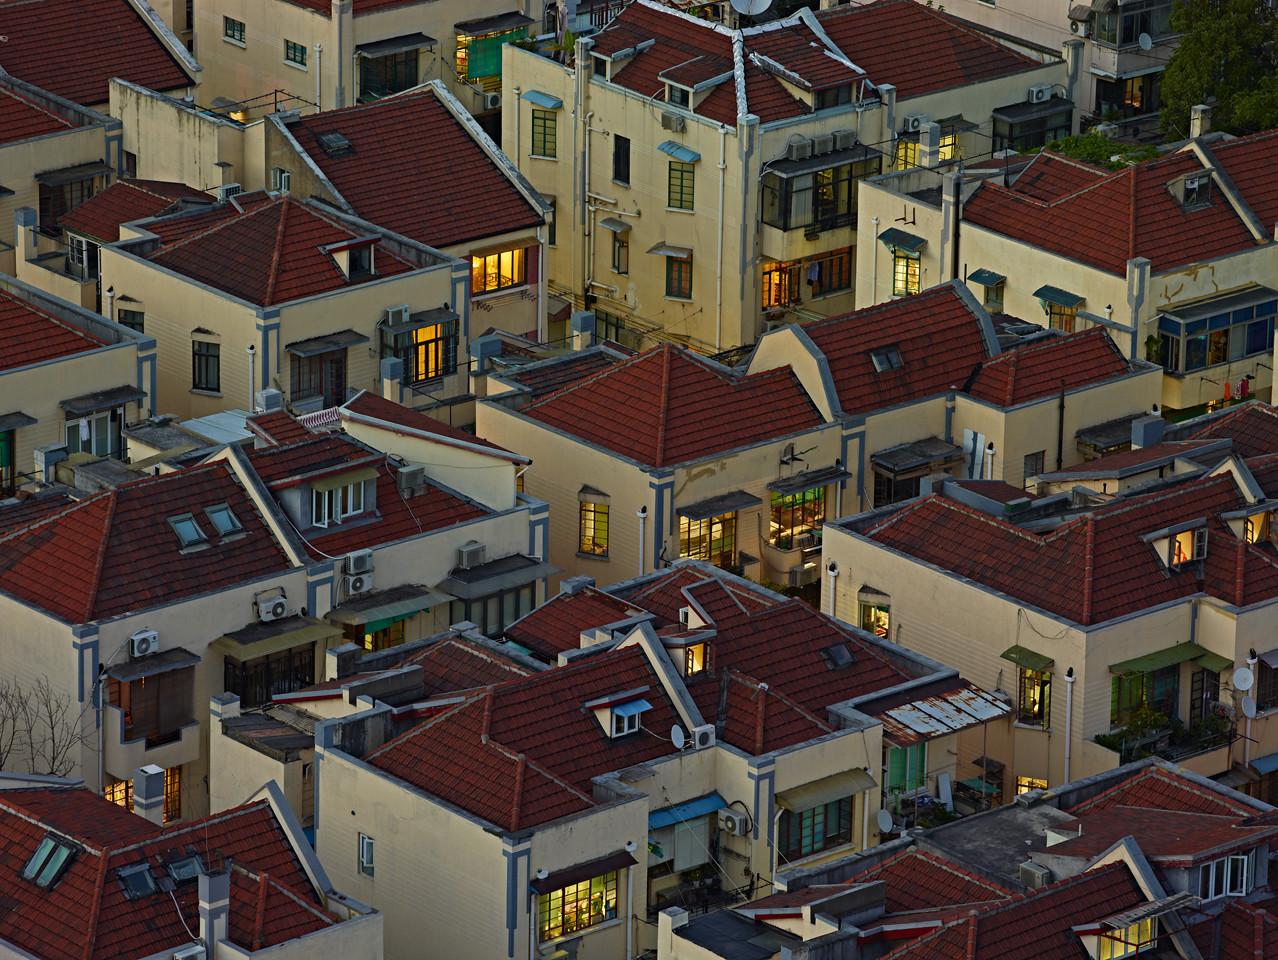 20) Houses